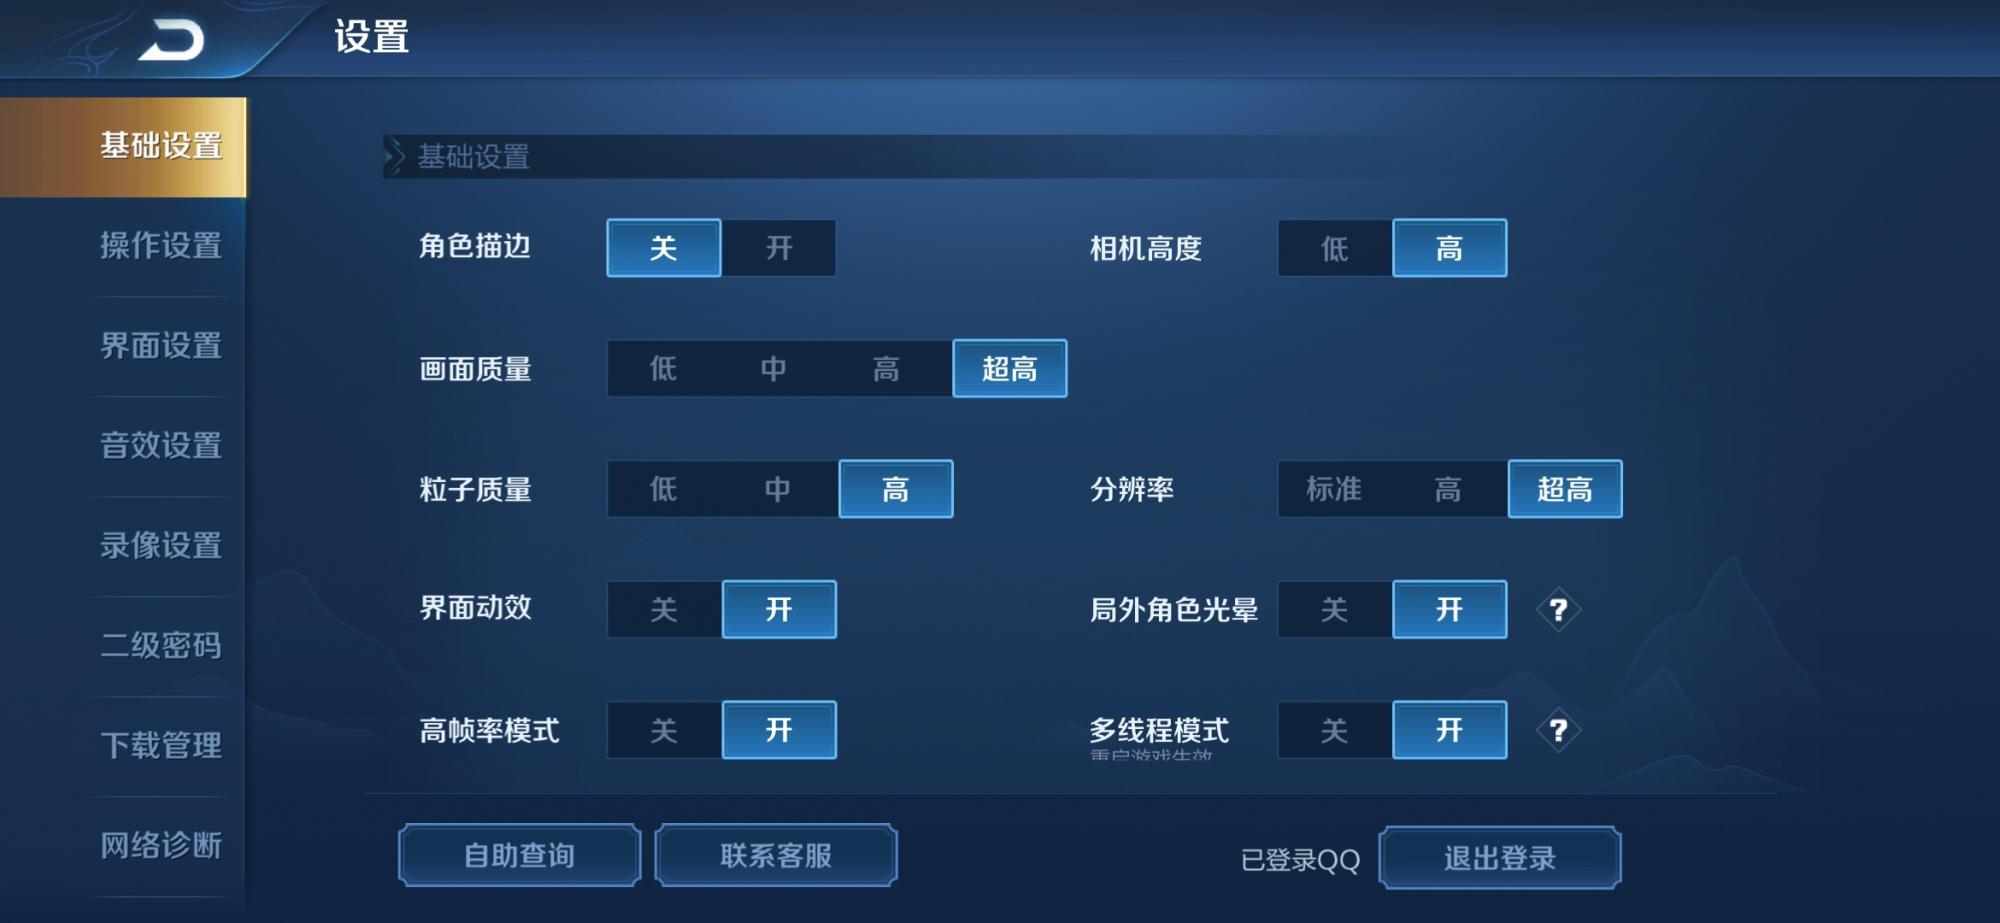 Screenshot_20190714_151019_com.tencent.tmgp.sgame.jpg